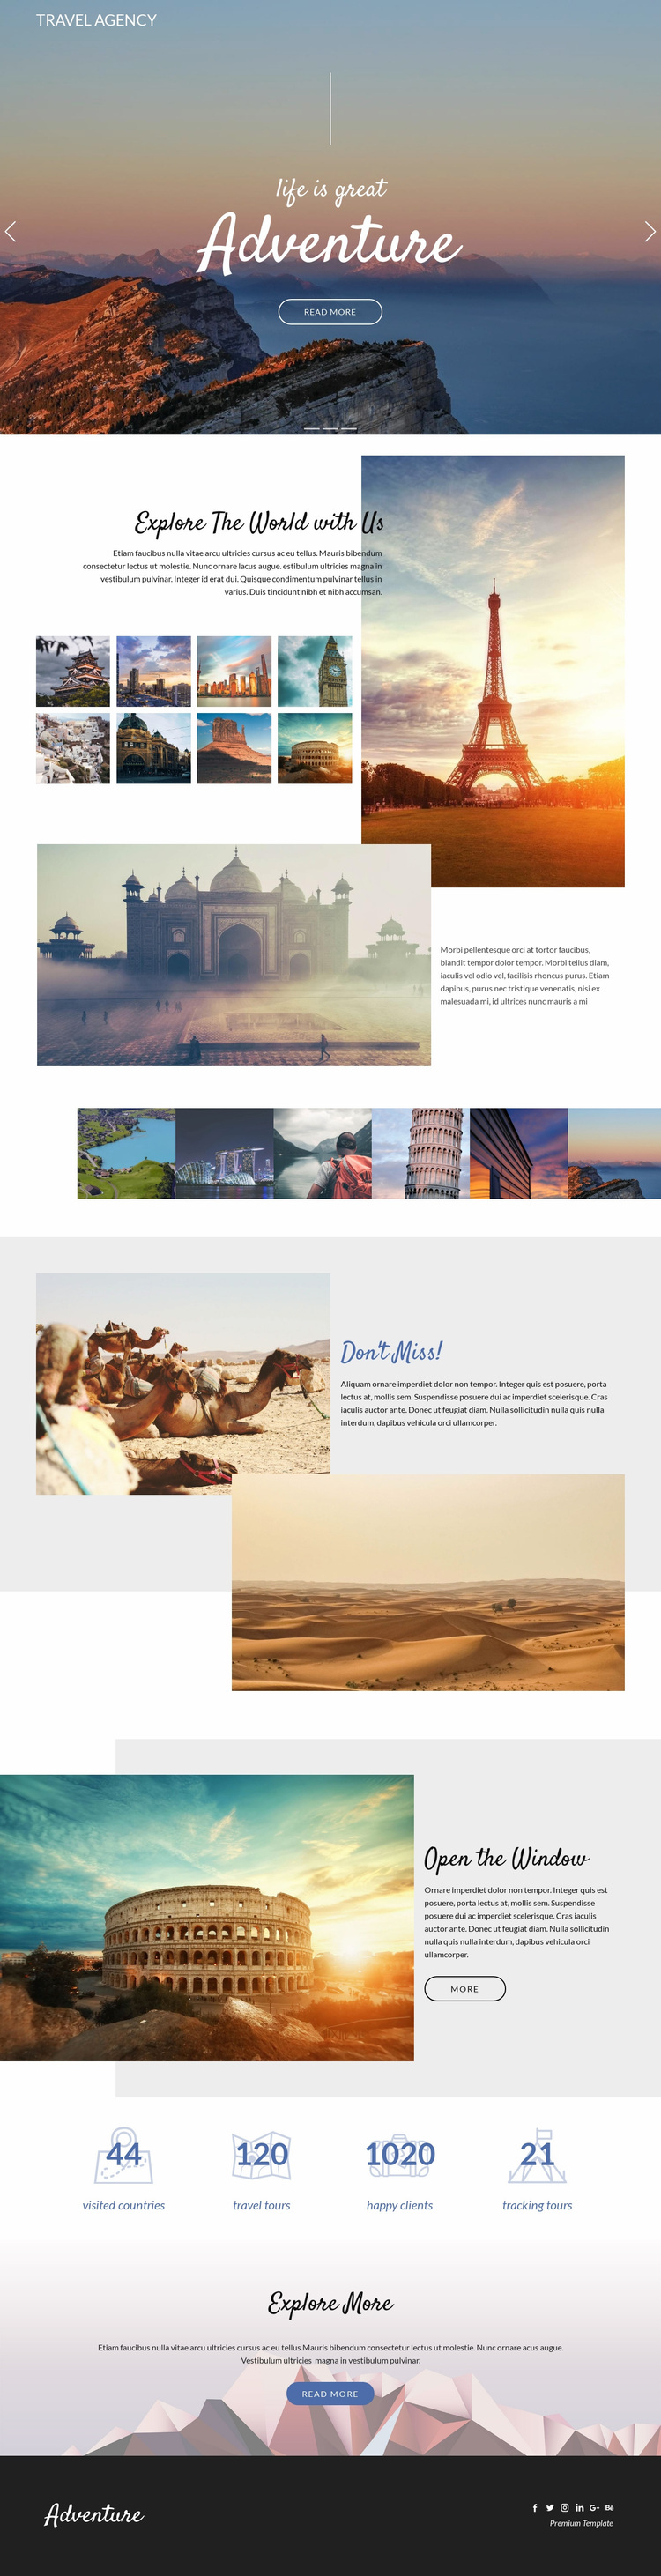 Adventure and travel Website Design